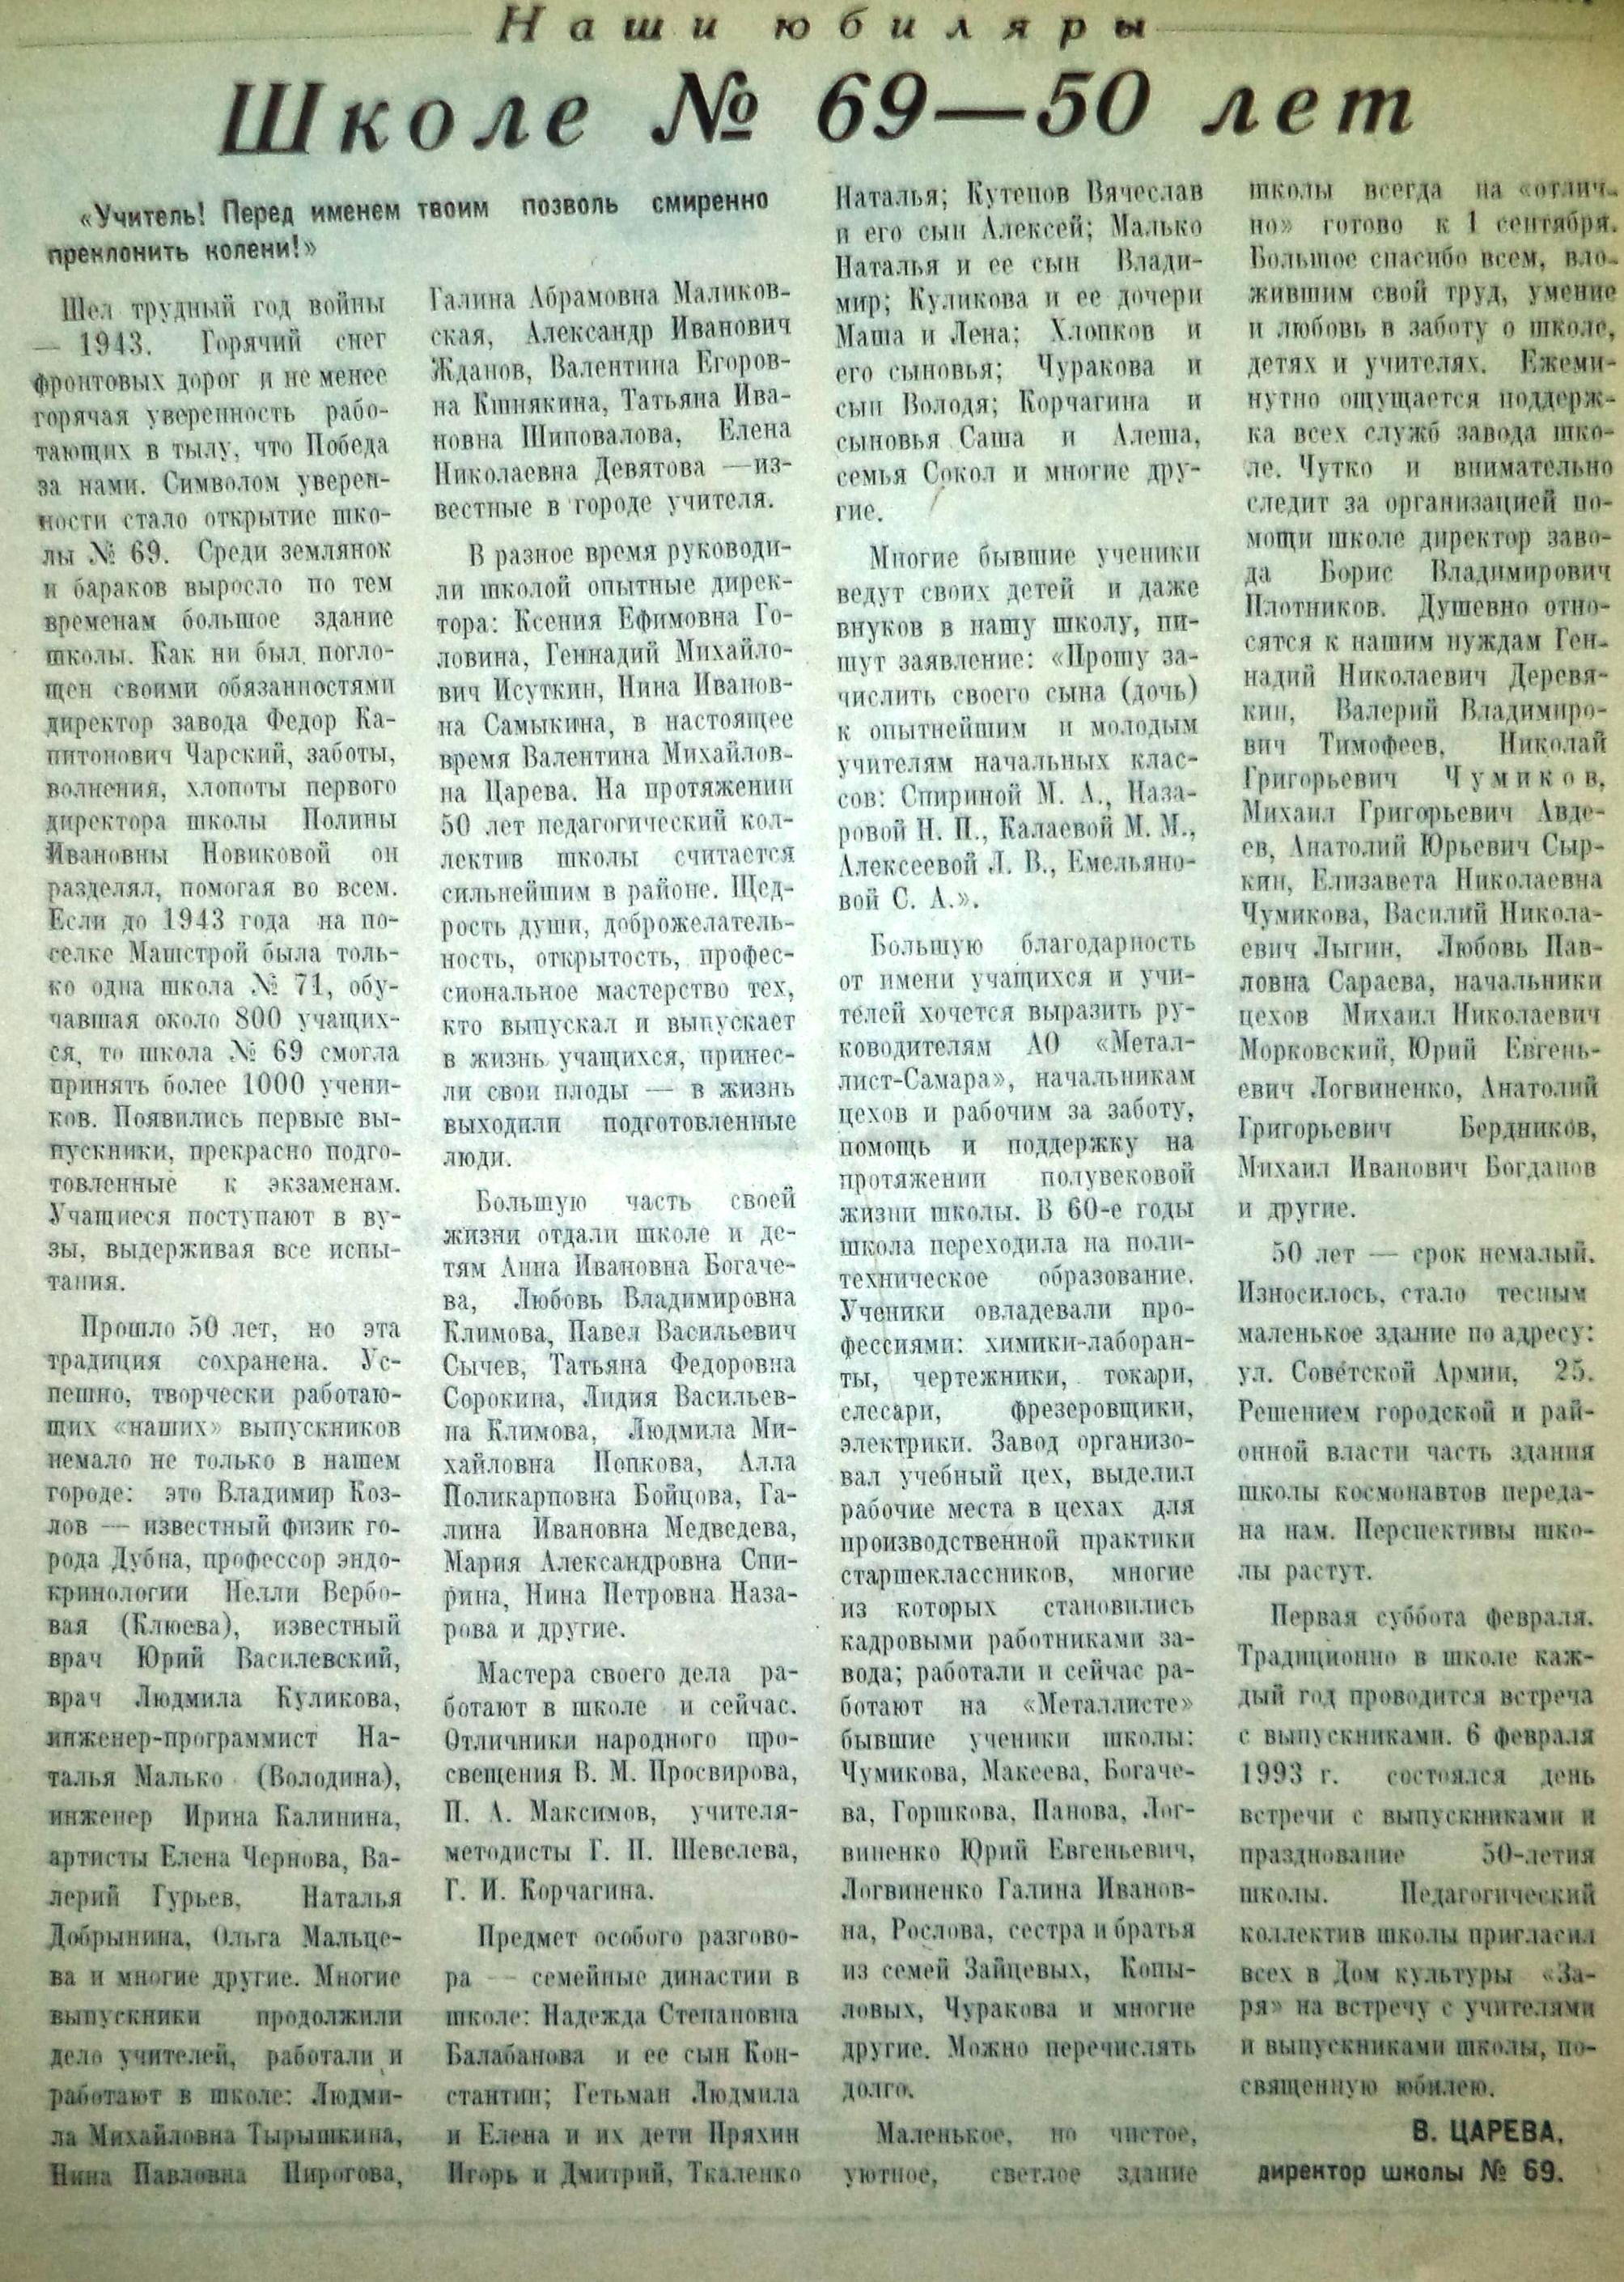 СА-ФОТО-008-За боевые темпы-1993-11 февраля-1-min